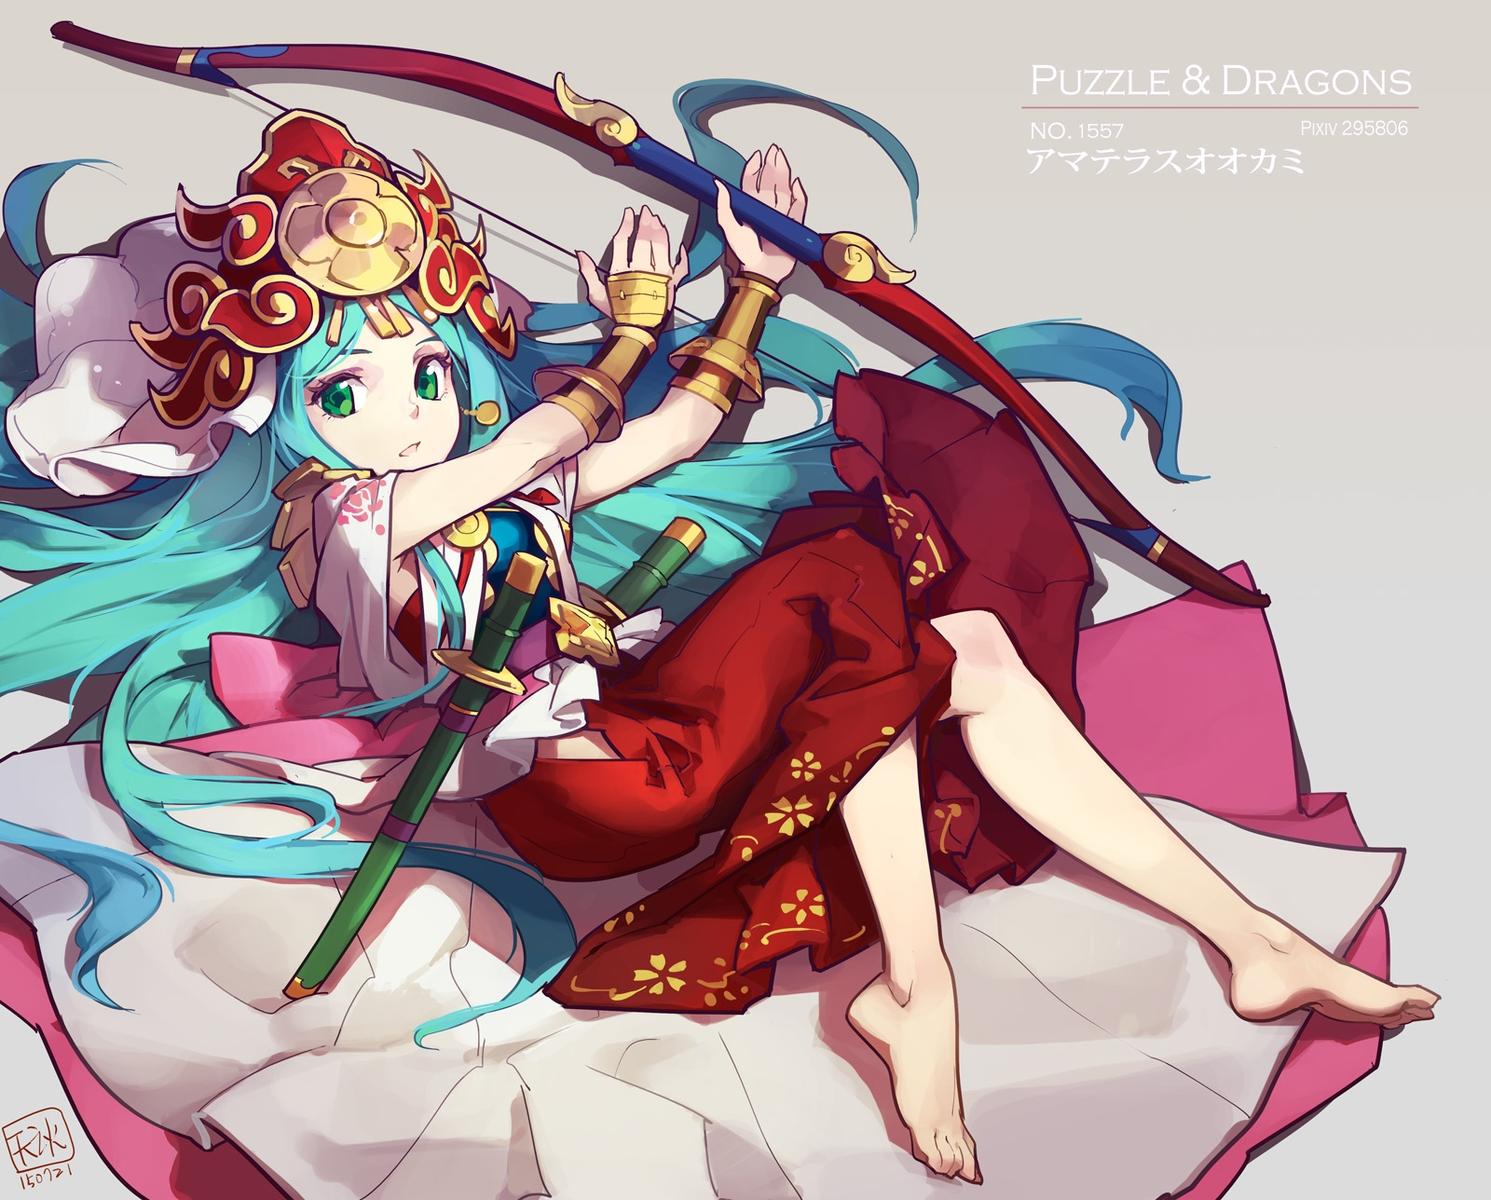 amaterasu_(p&d) aqua_hair barefoot bow_(weapon) green_eyes headdress japanese_clothes long_hair puzzle_&_dragons sword tennohi weapon wristwear